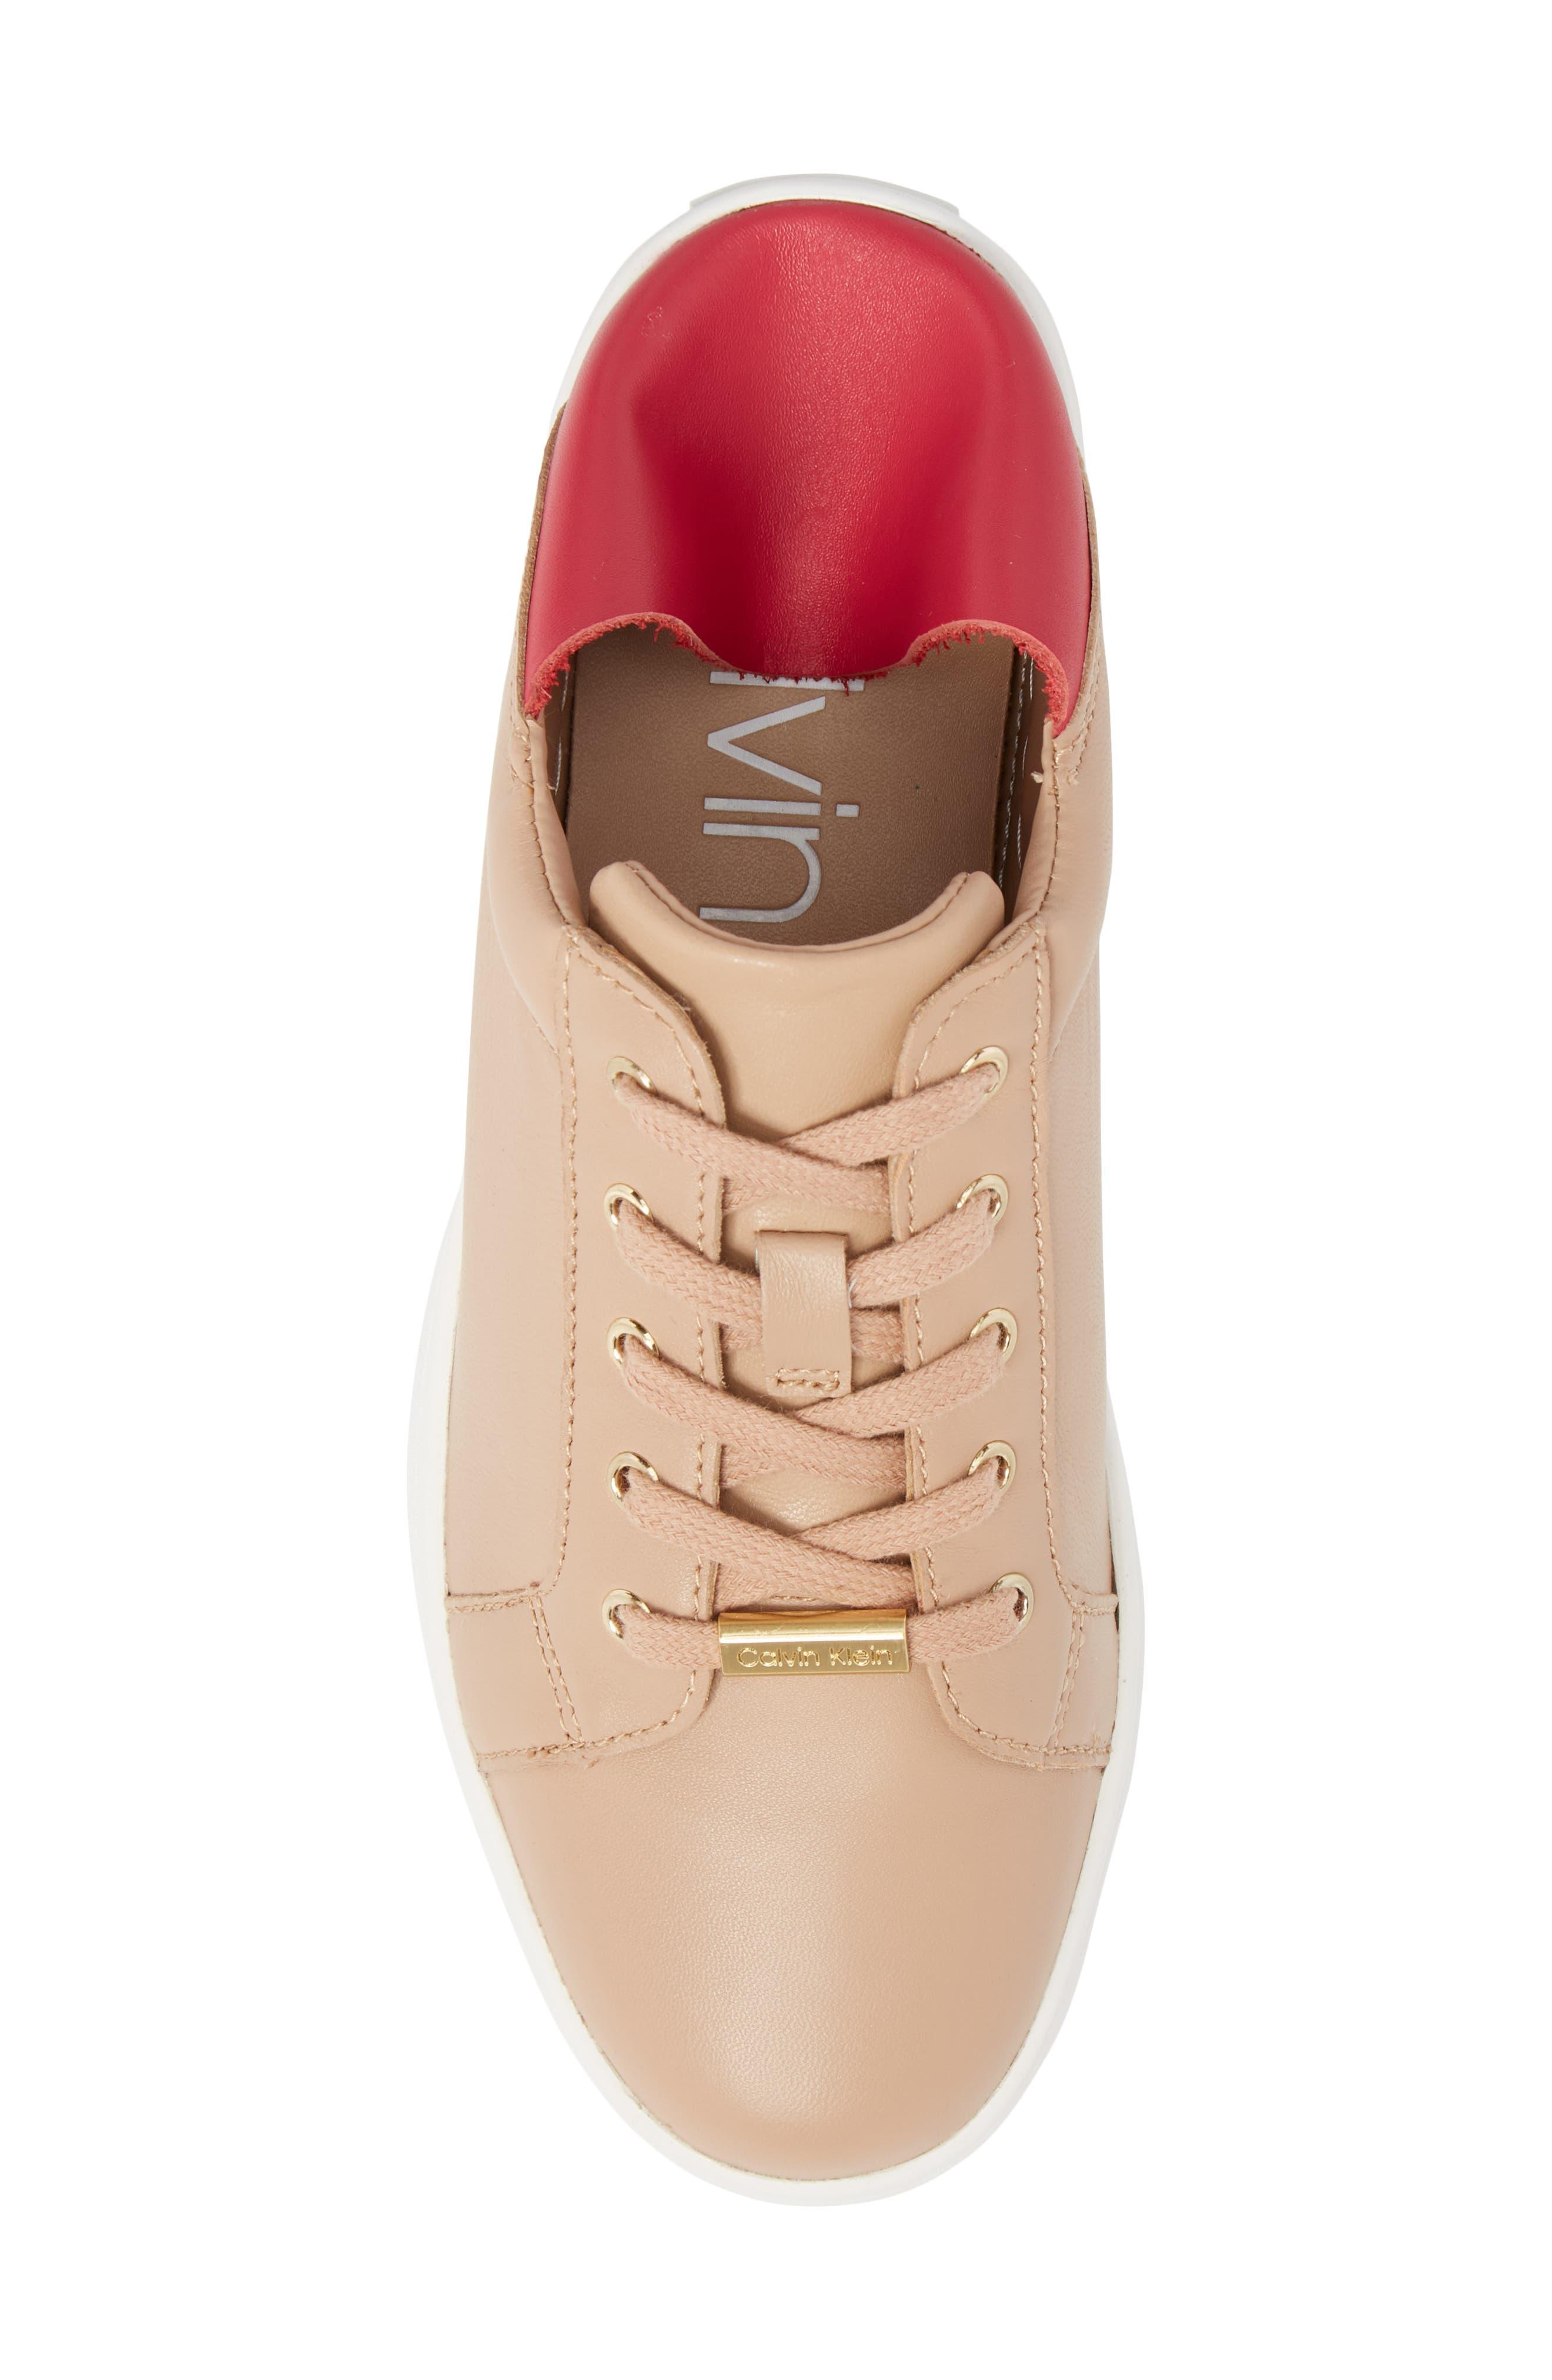 Danica Convertible Sneaker,                             Alternate thumbnail 6, color,                             Desert Sand Leather